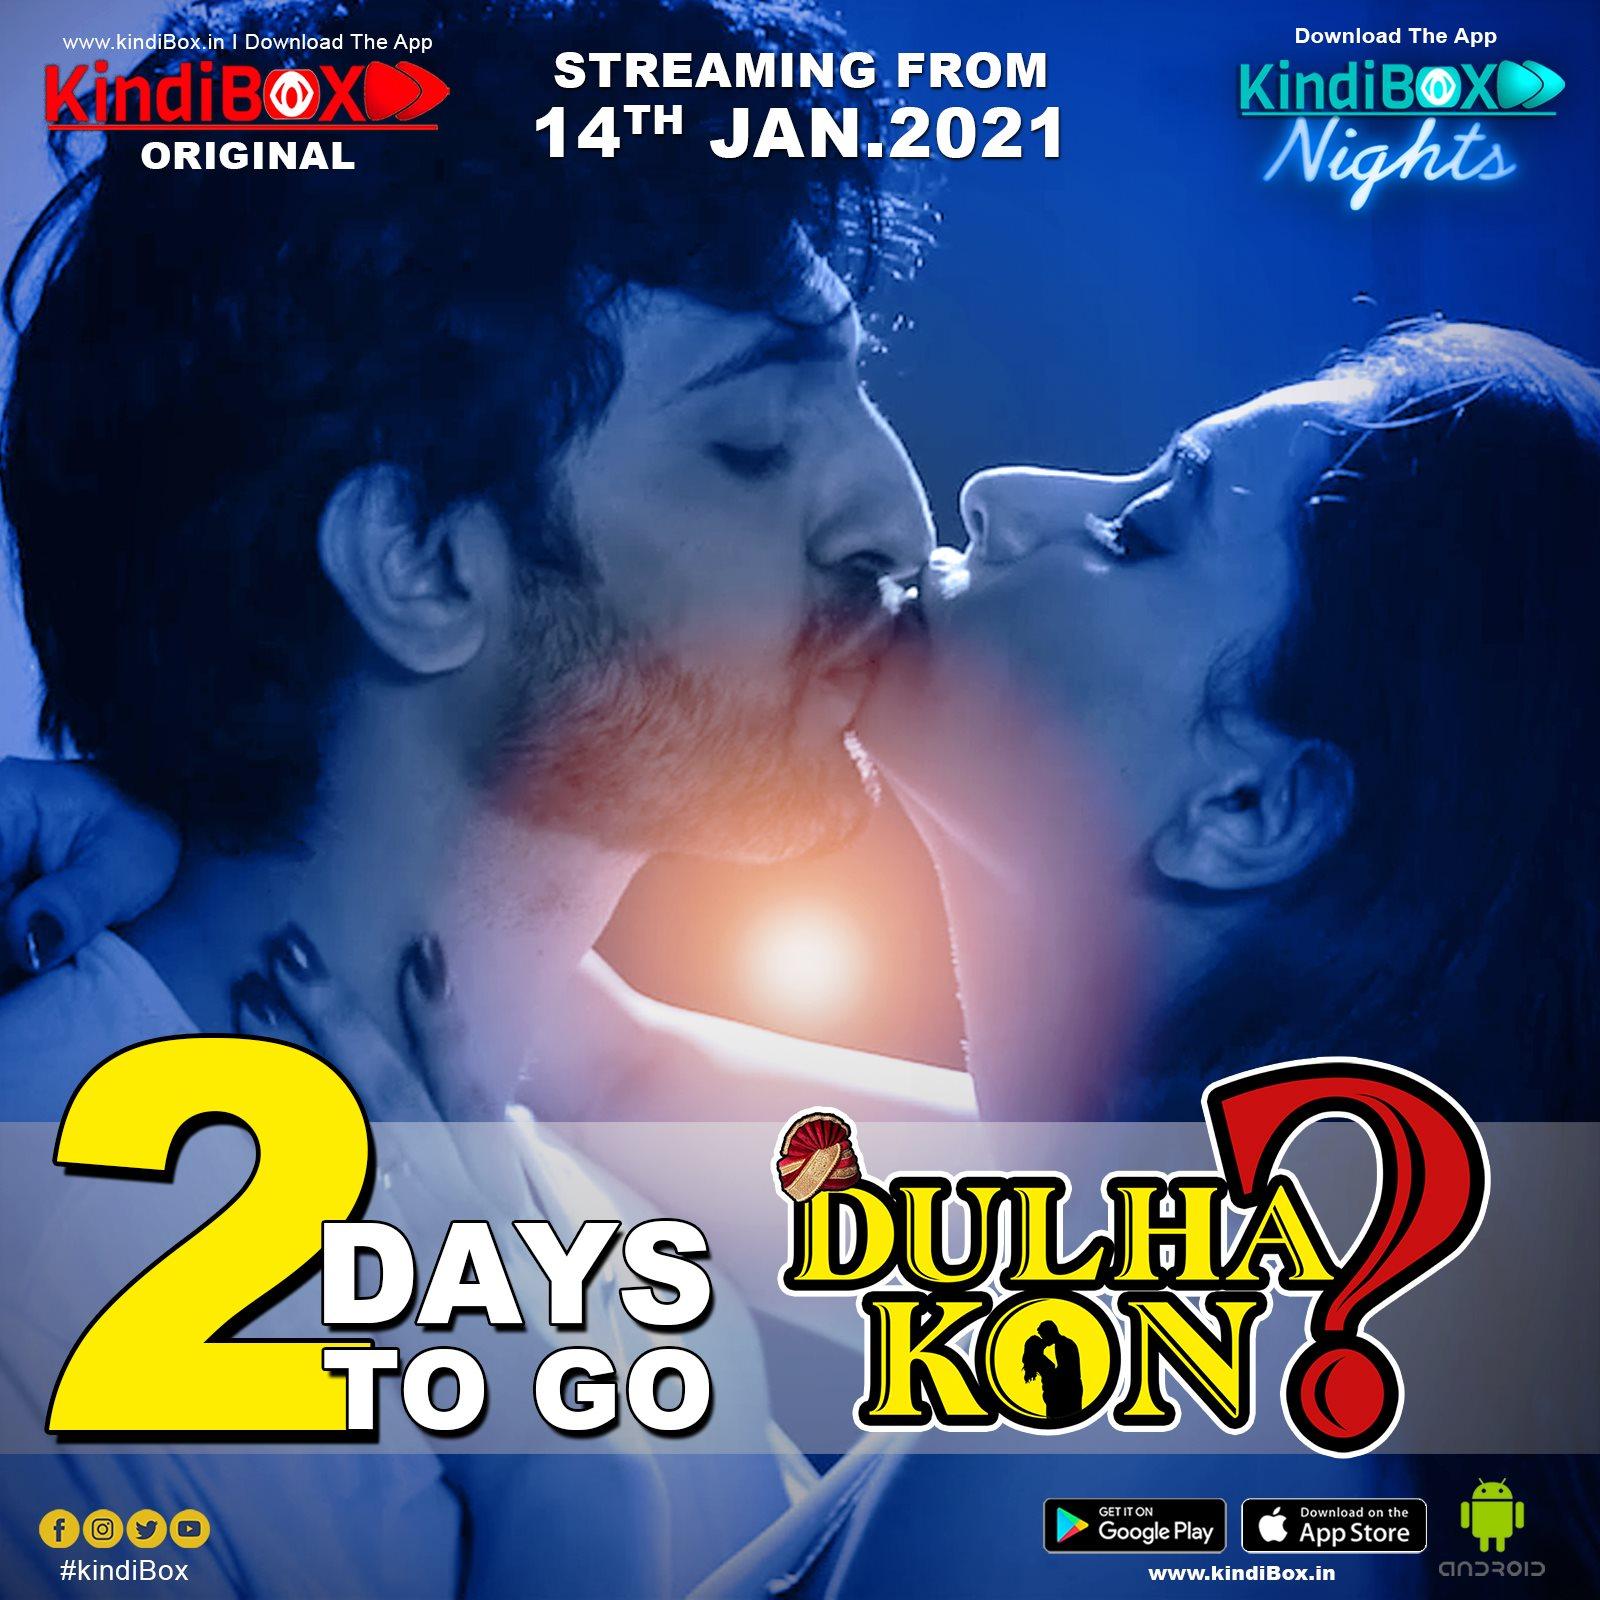 18+ Dulha Kon S01 2021 Hindi Kindibox Original Complete Web Series 720p HDRip 800MB Download